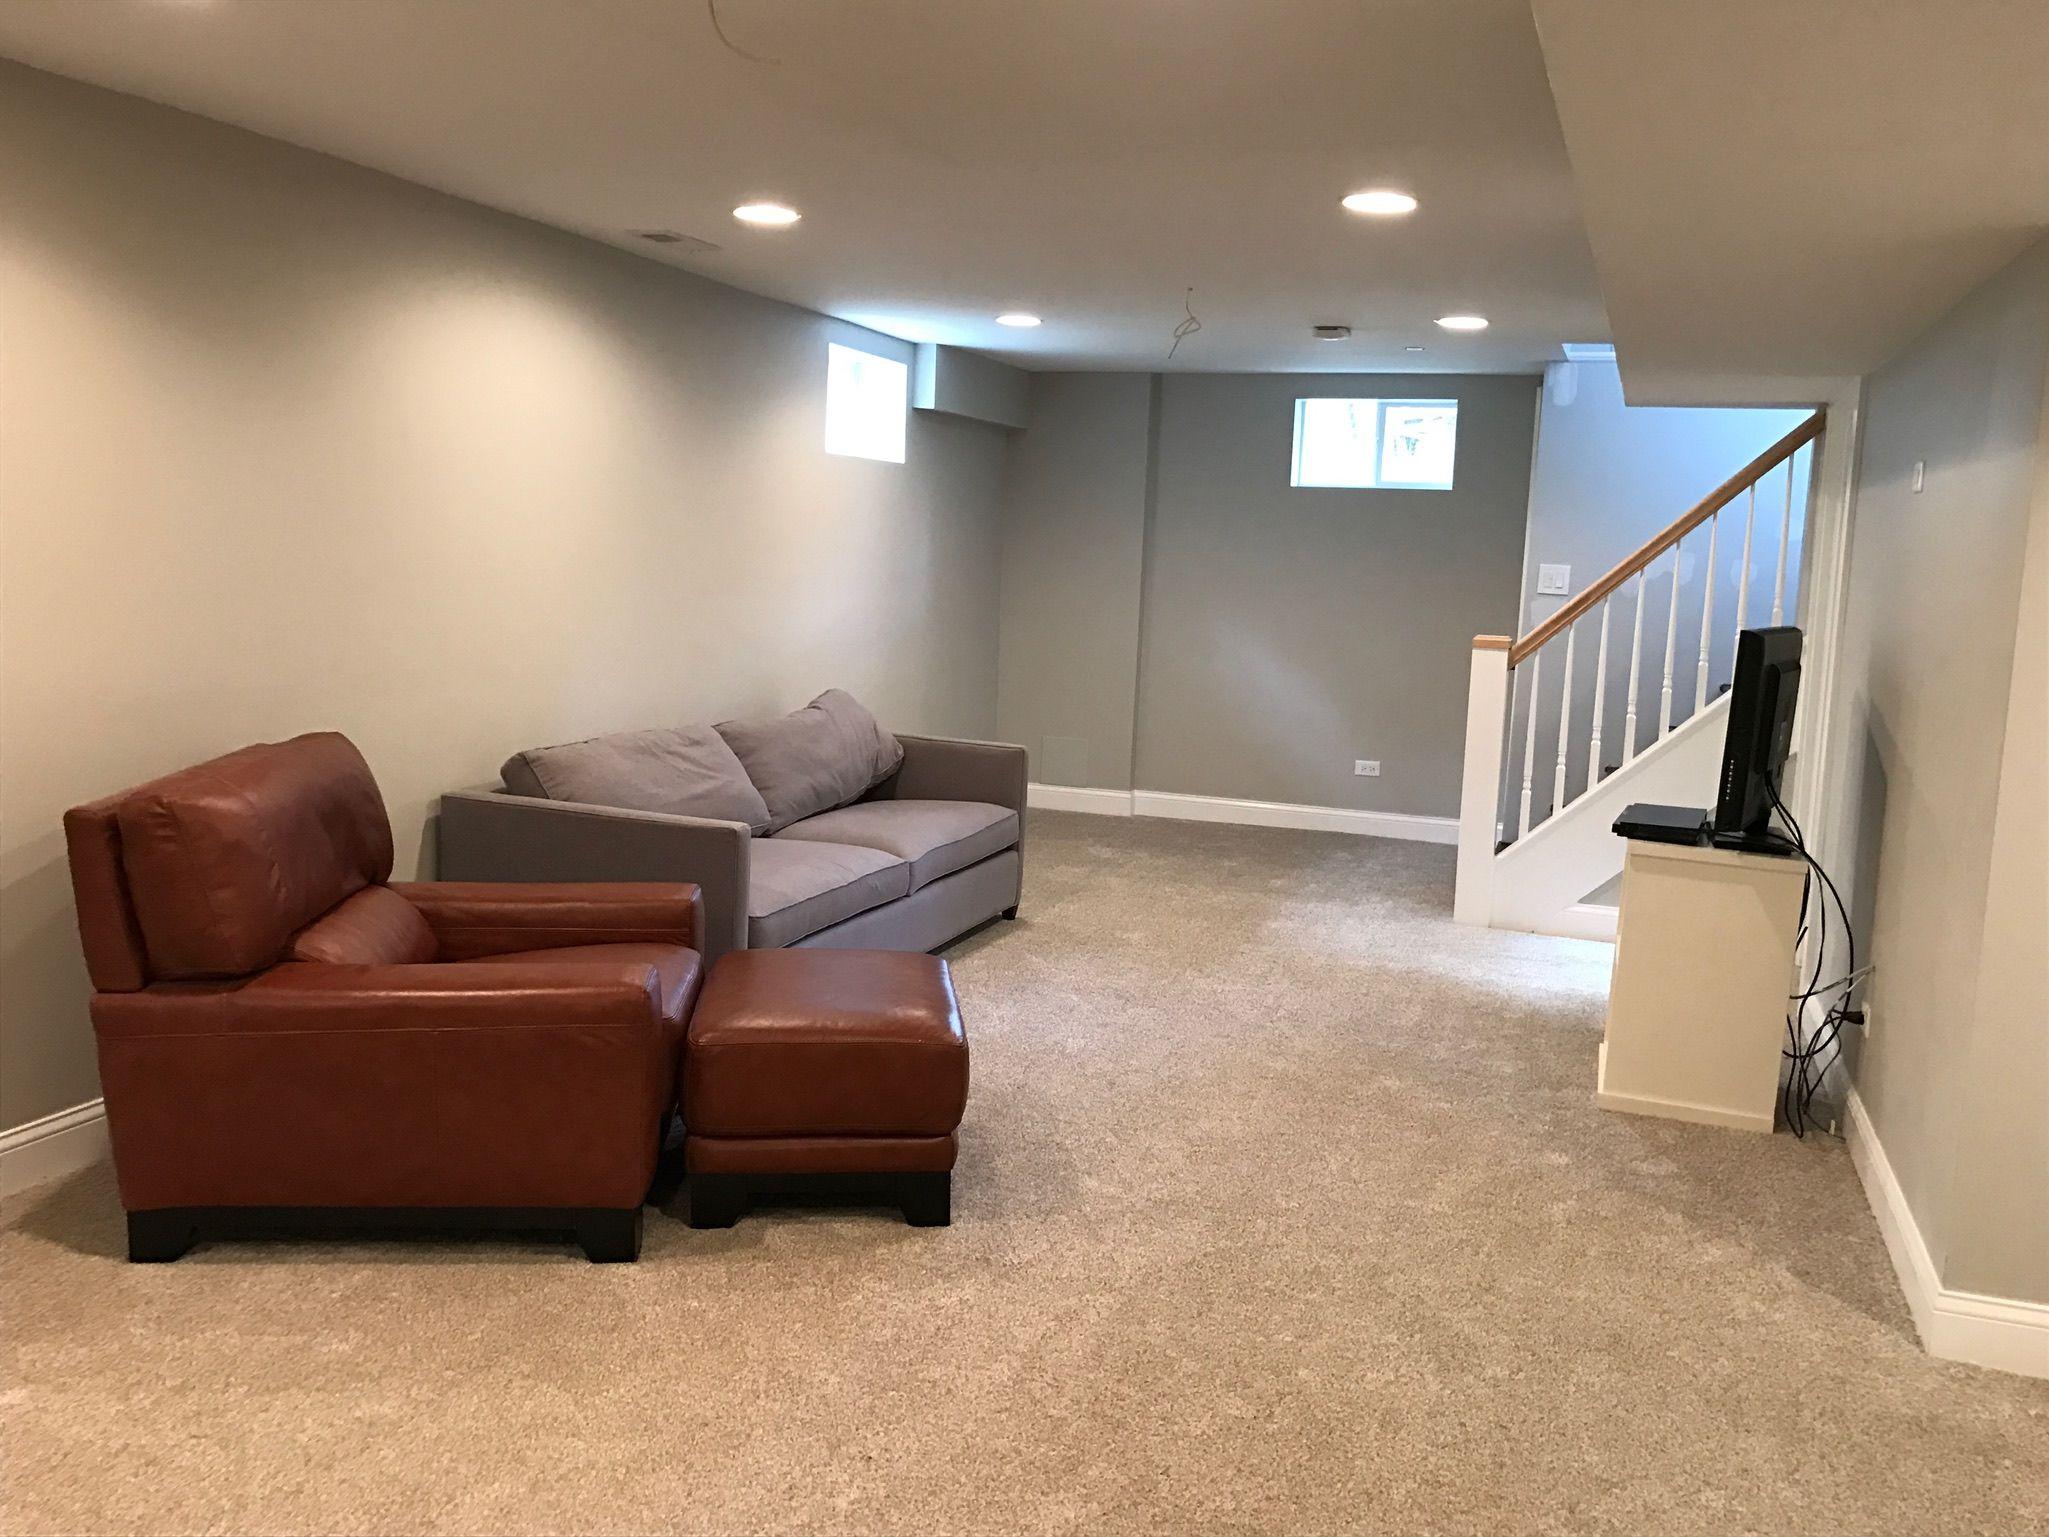 The Finished Flip Basement remodeling, Cheap remodel